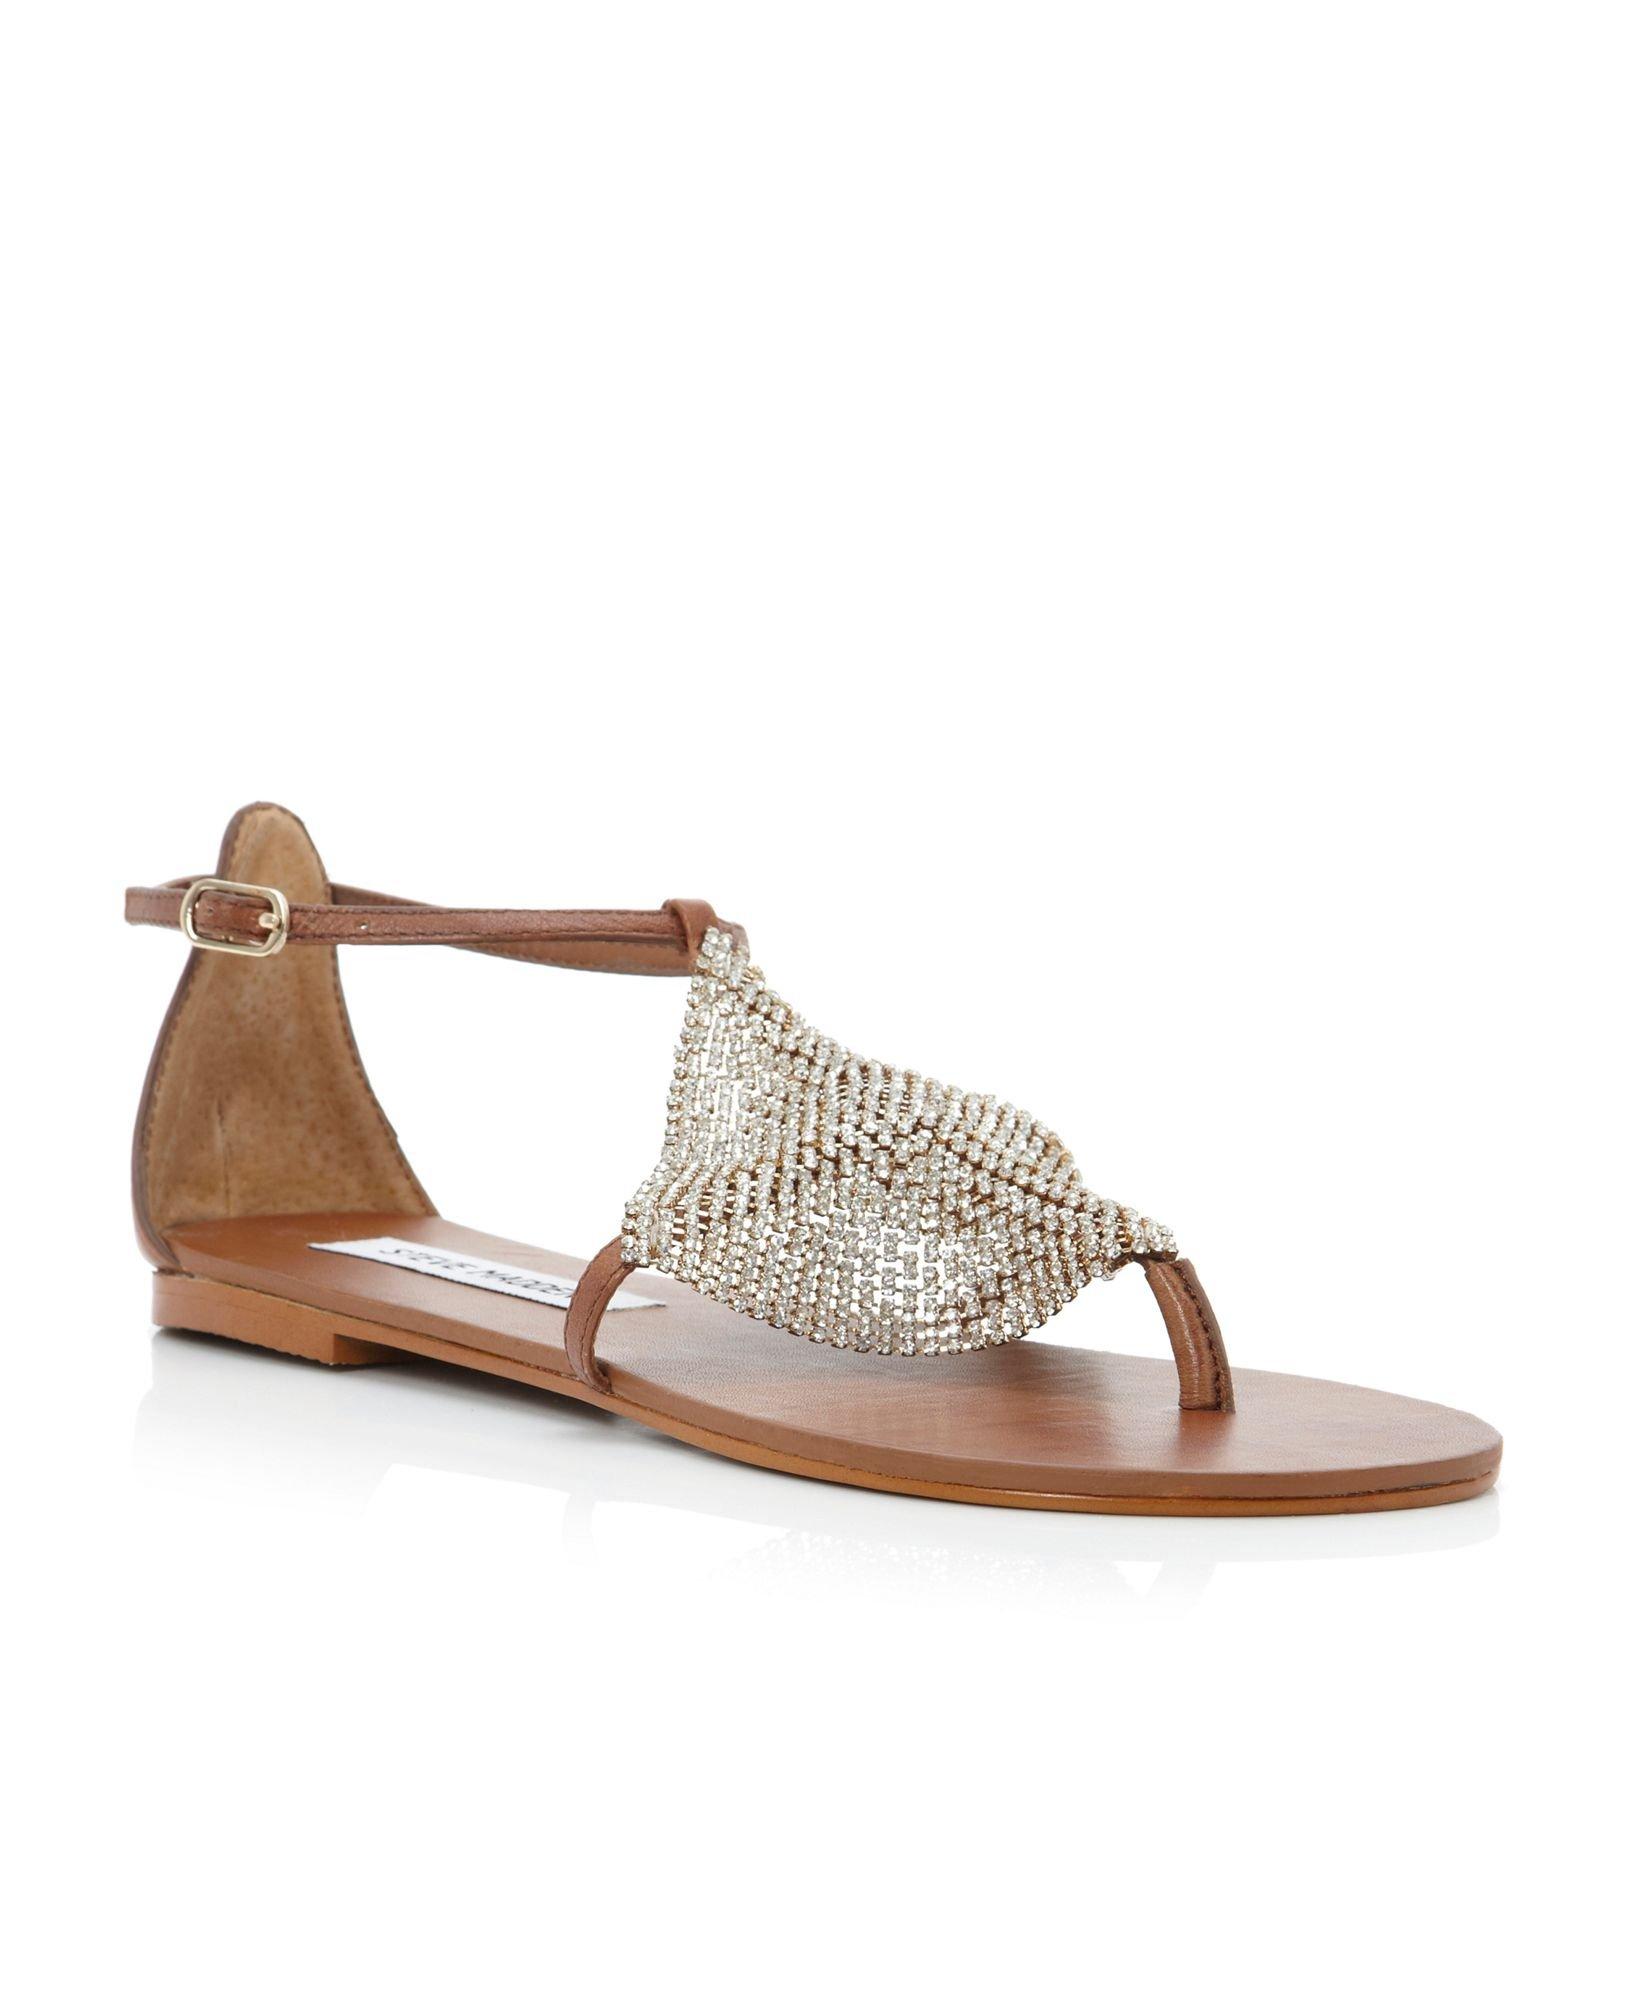 steve madden shineyy diamante toe flat sandals in